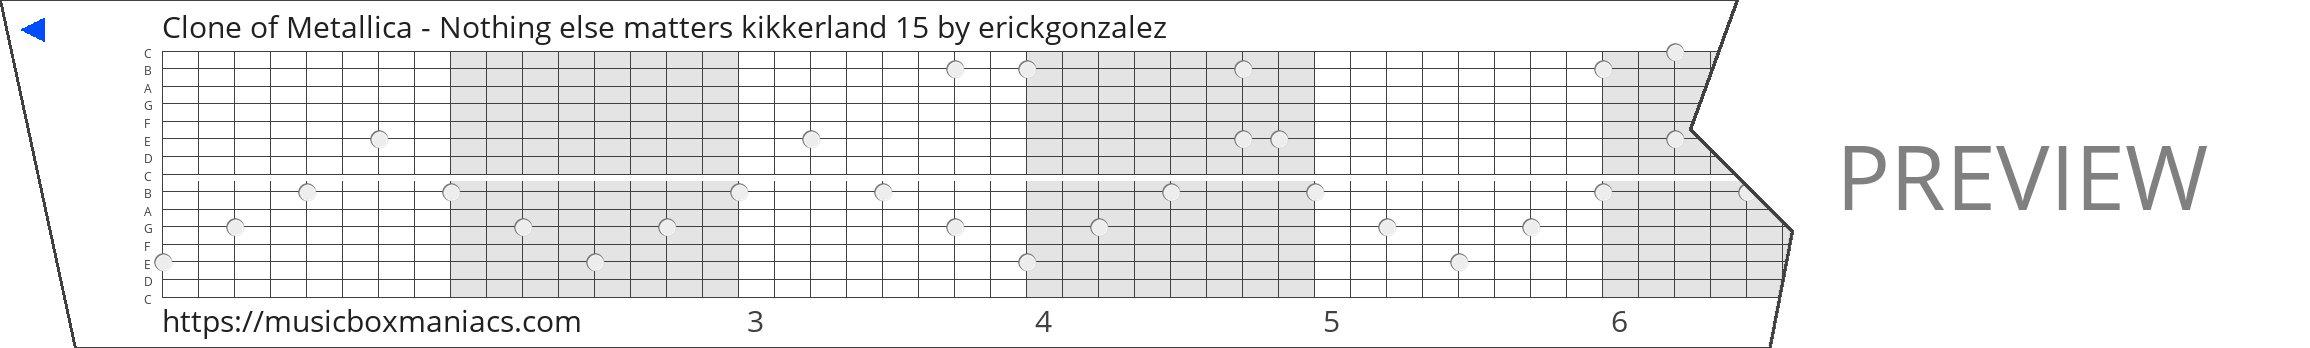 Clone of Metallica - Nothing else matters kikkerland 15 15 note music box paper strip